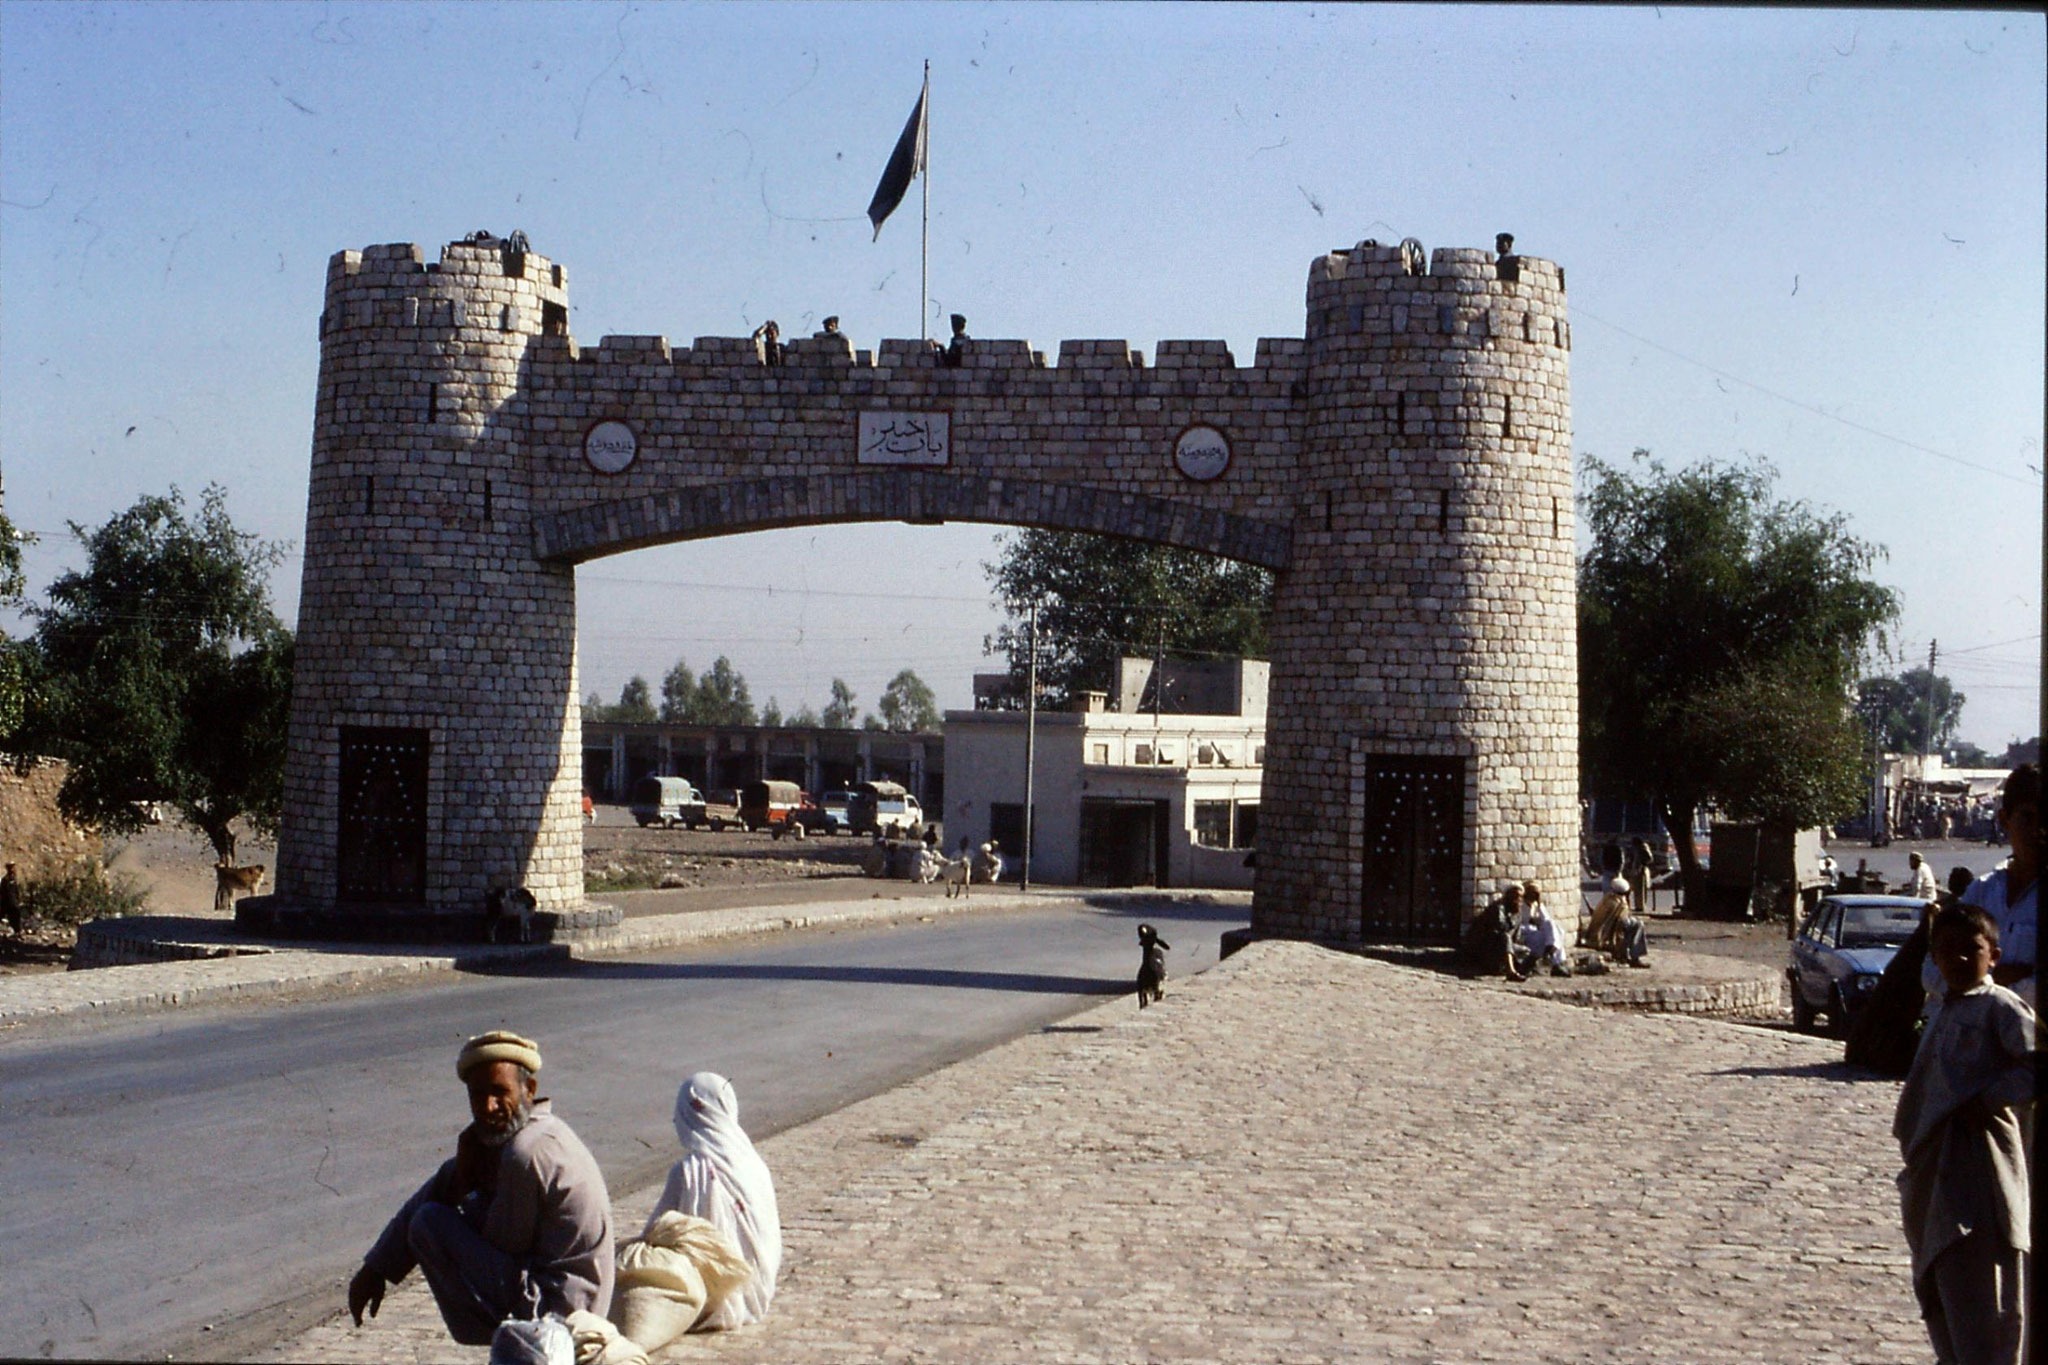 6/11/1989: 19: Khyber Pass Jamrud Gate